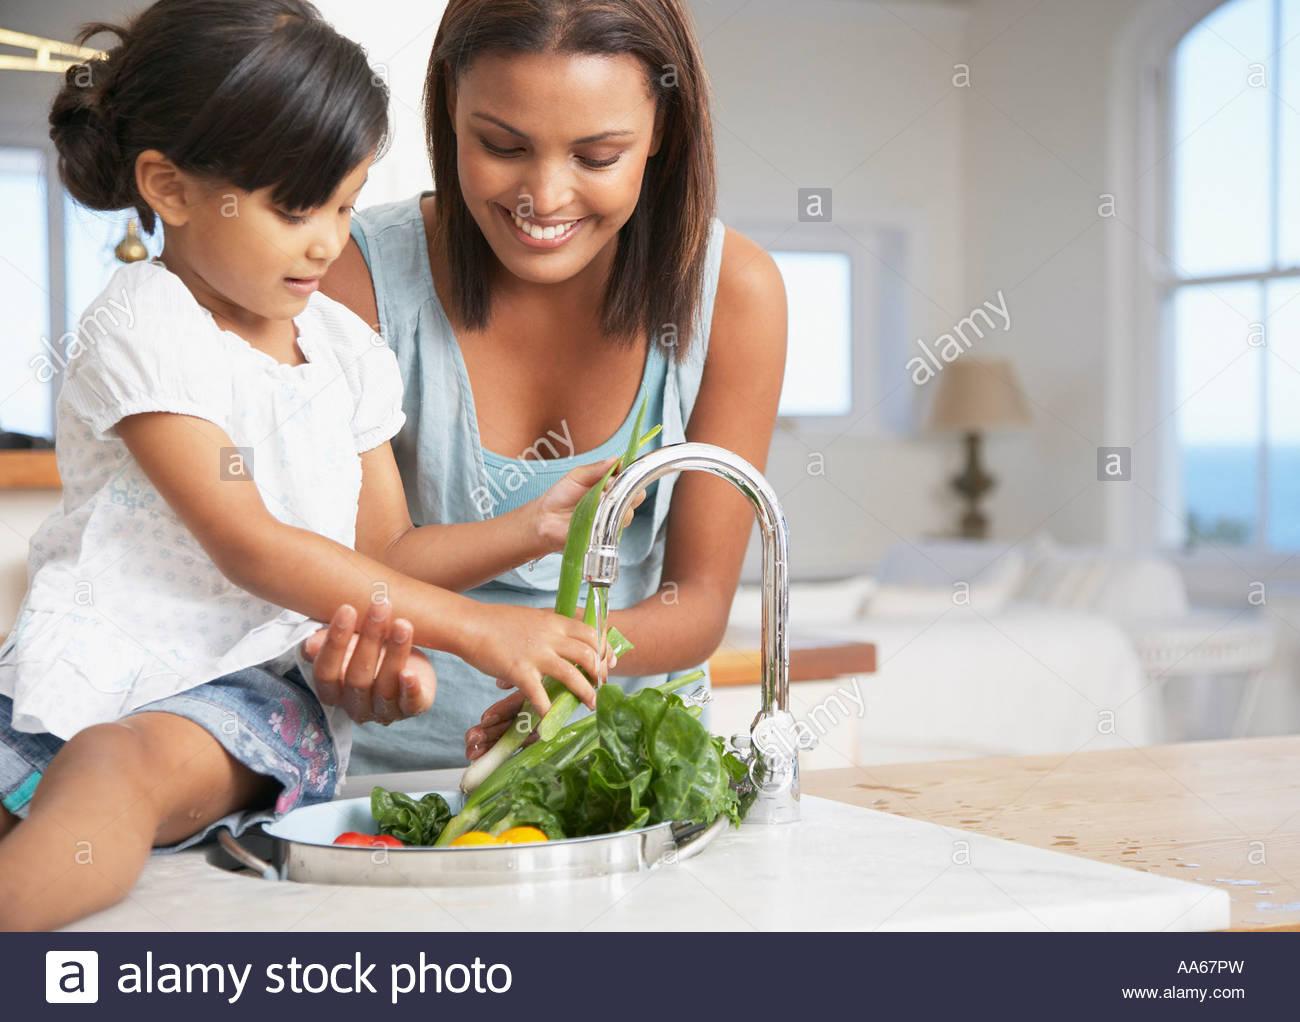 Madre e hija preparando la comida en la cocina Imagen De Stock